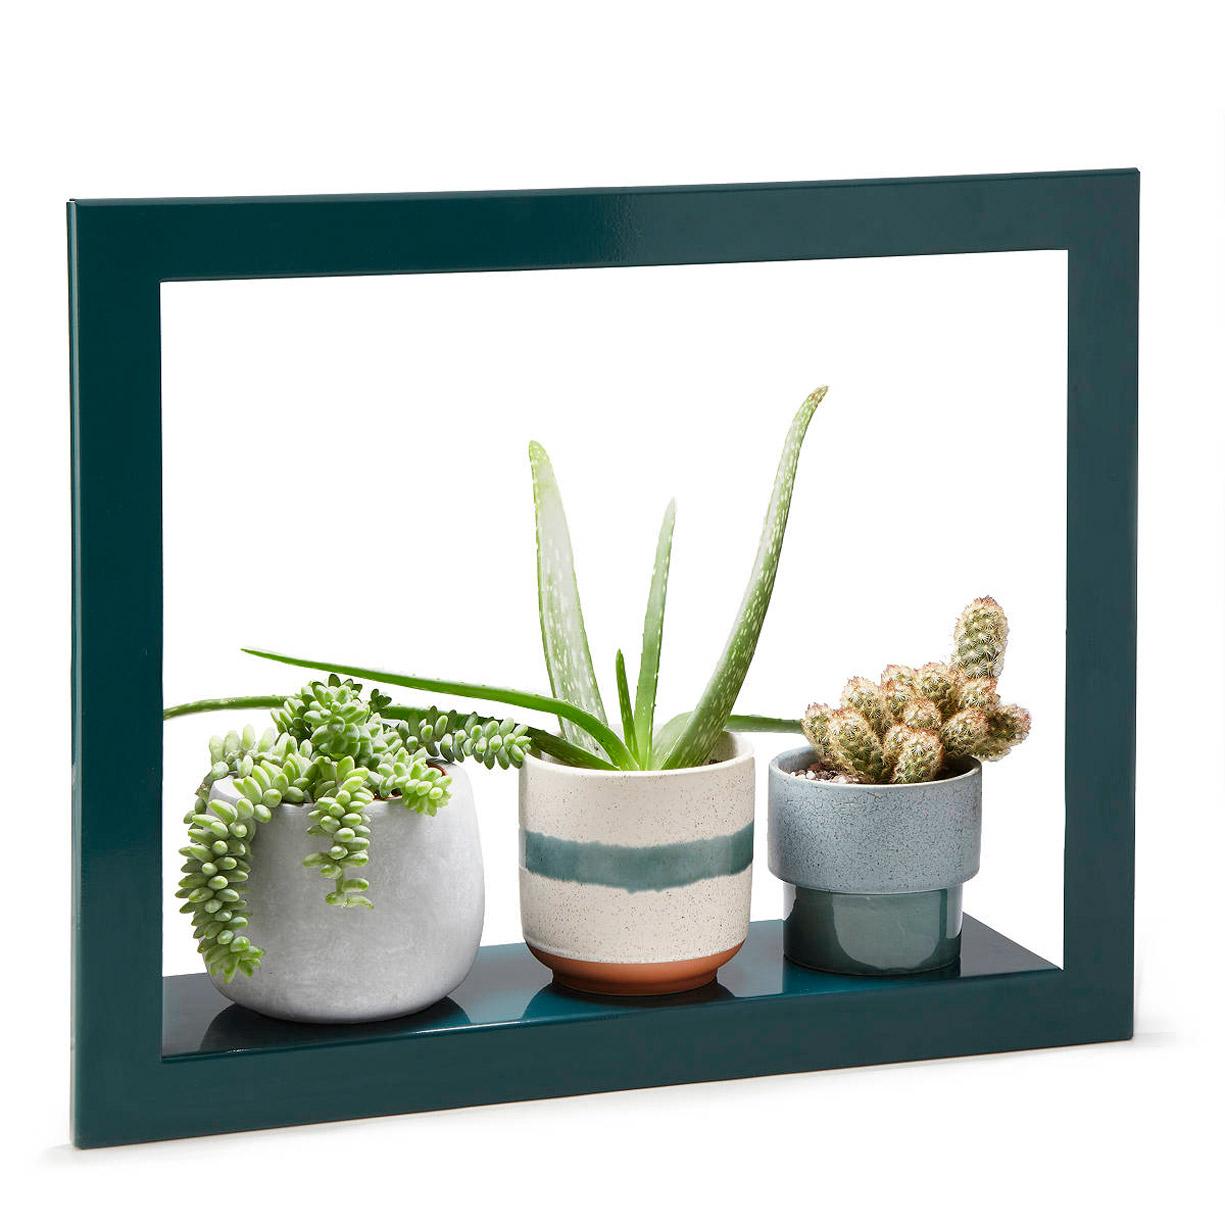 Growlight Frame Shelf - Best Christmas Gifts 2019